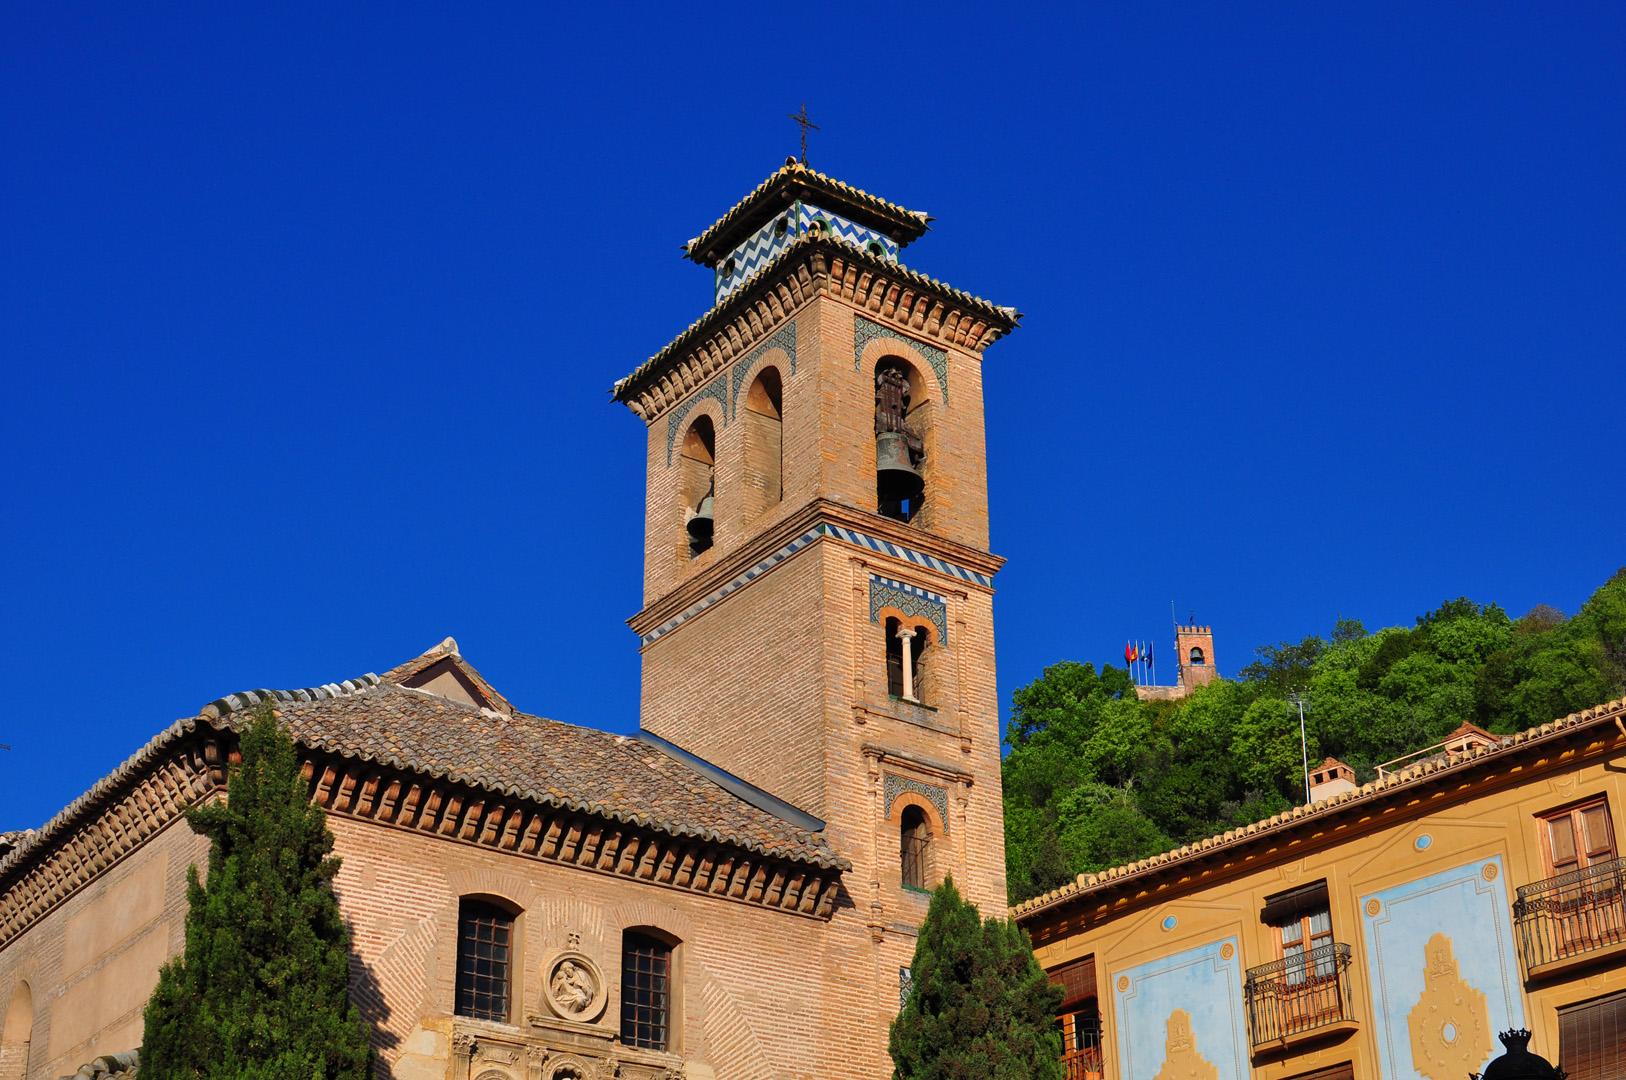 Antes de subir a la Alhambra